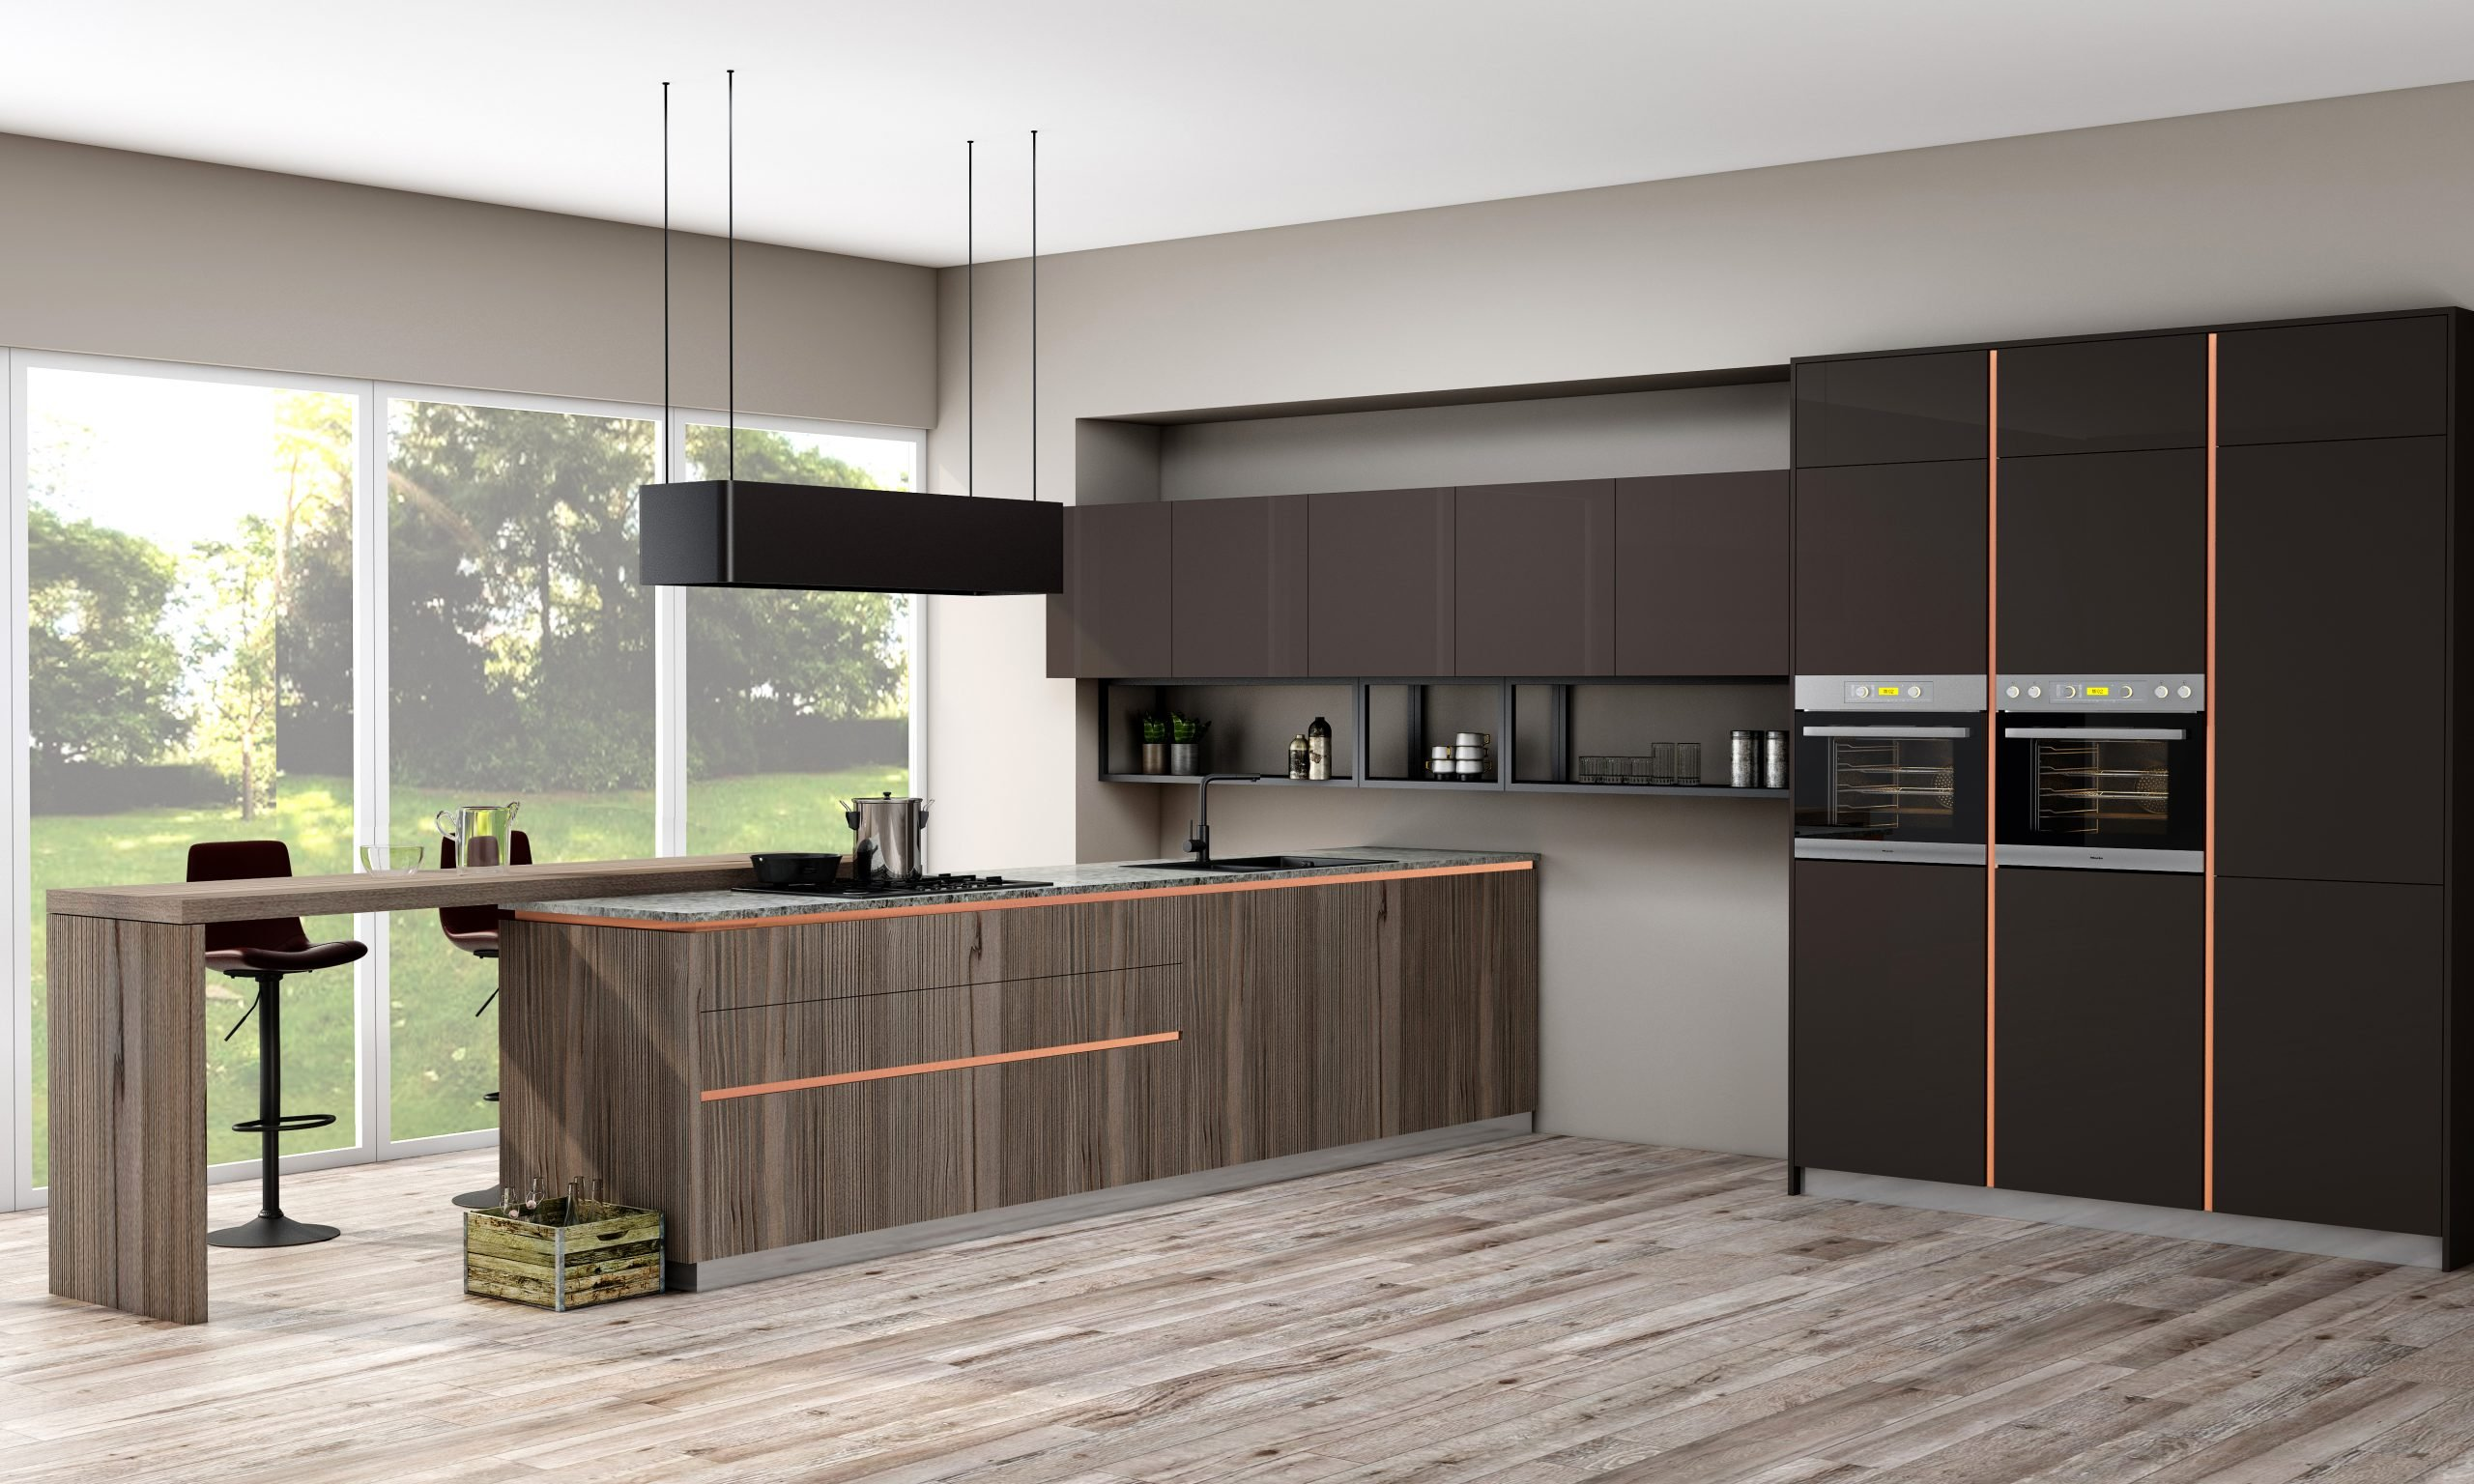 Premiumline Peninsula Kitchen With Brass Handleless Profile Along With Island Graphite Grey and Woodgrain Finish